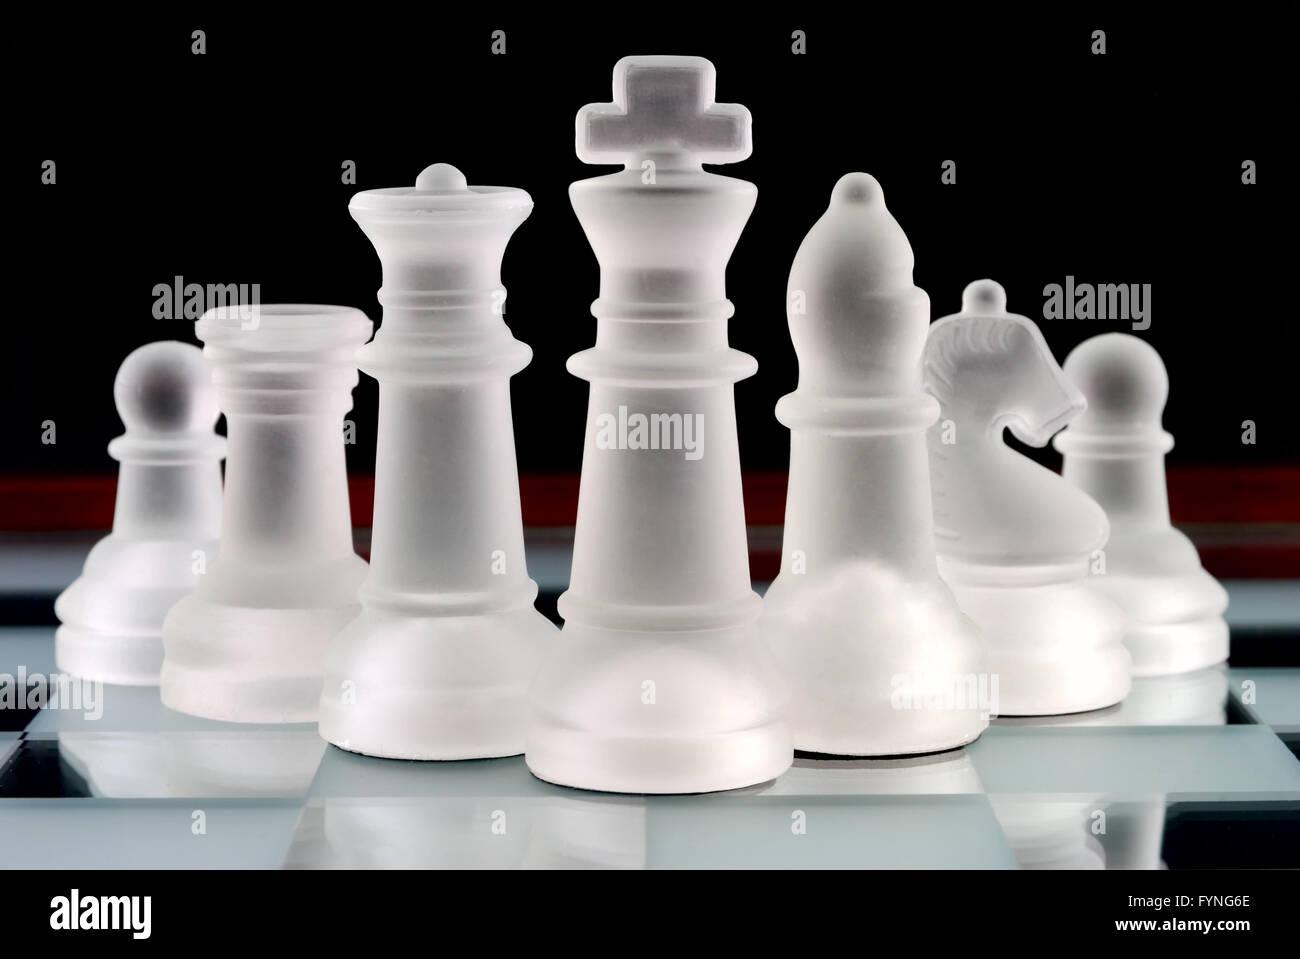 Chess team - Stock Image